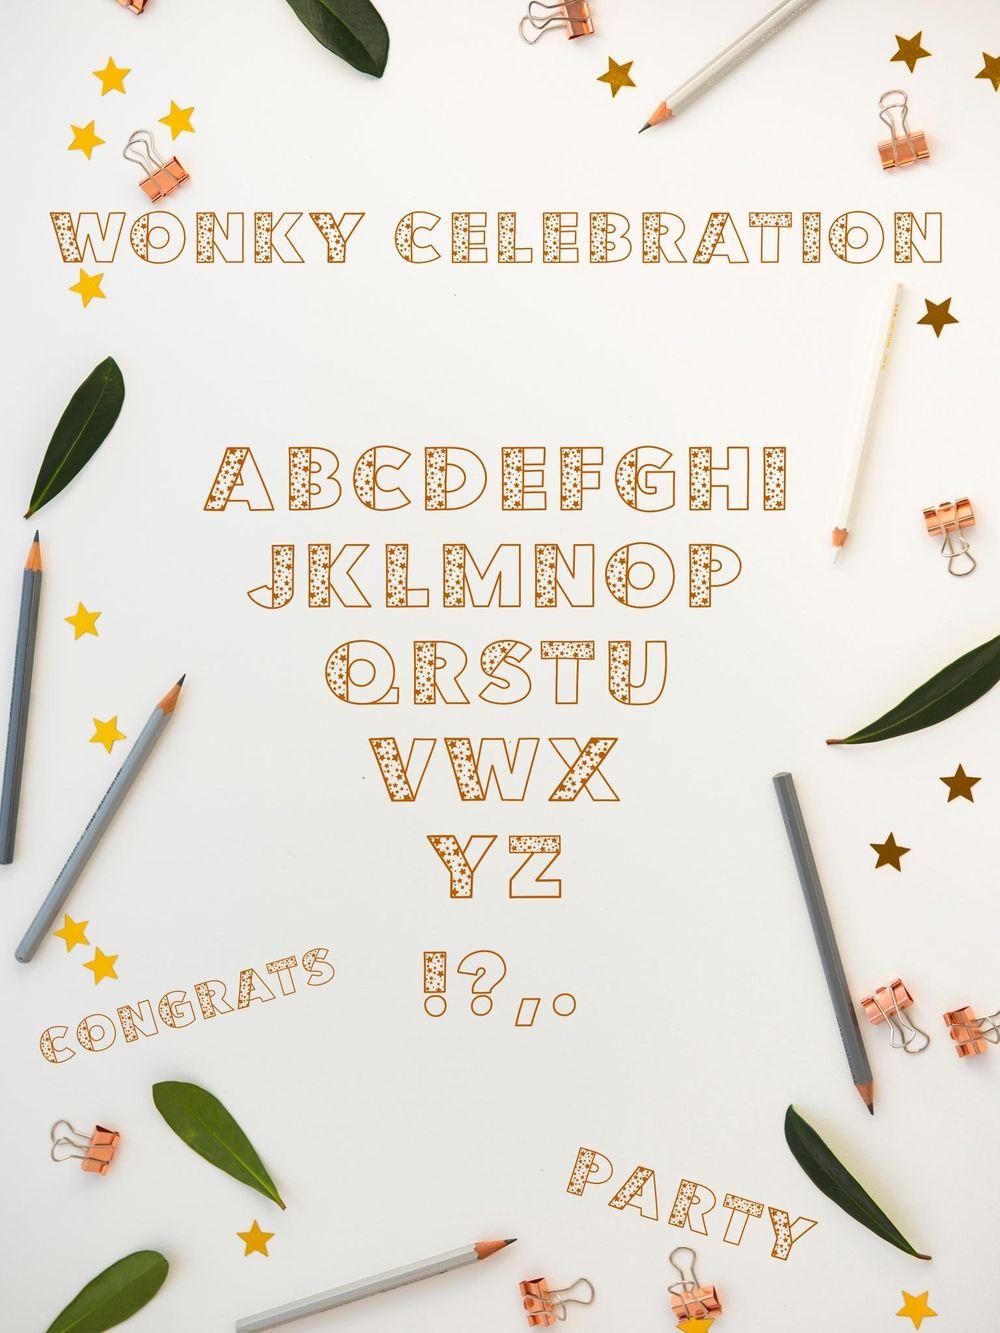 Wonky Celebration Font - image 1 - student project